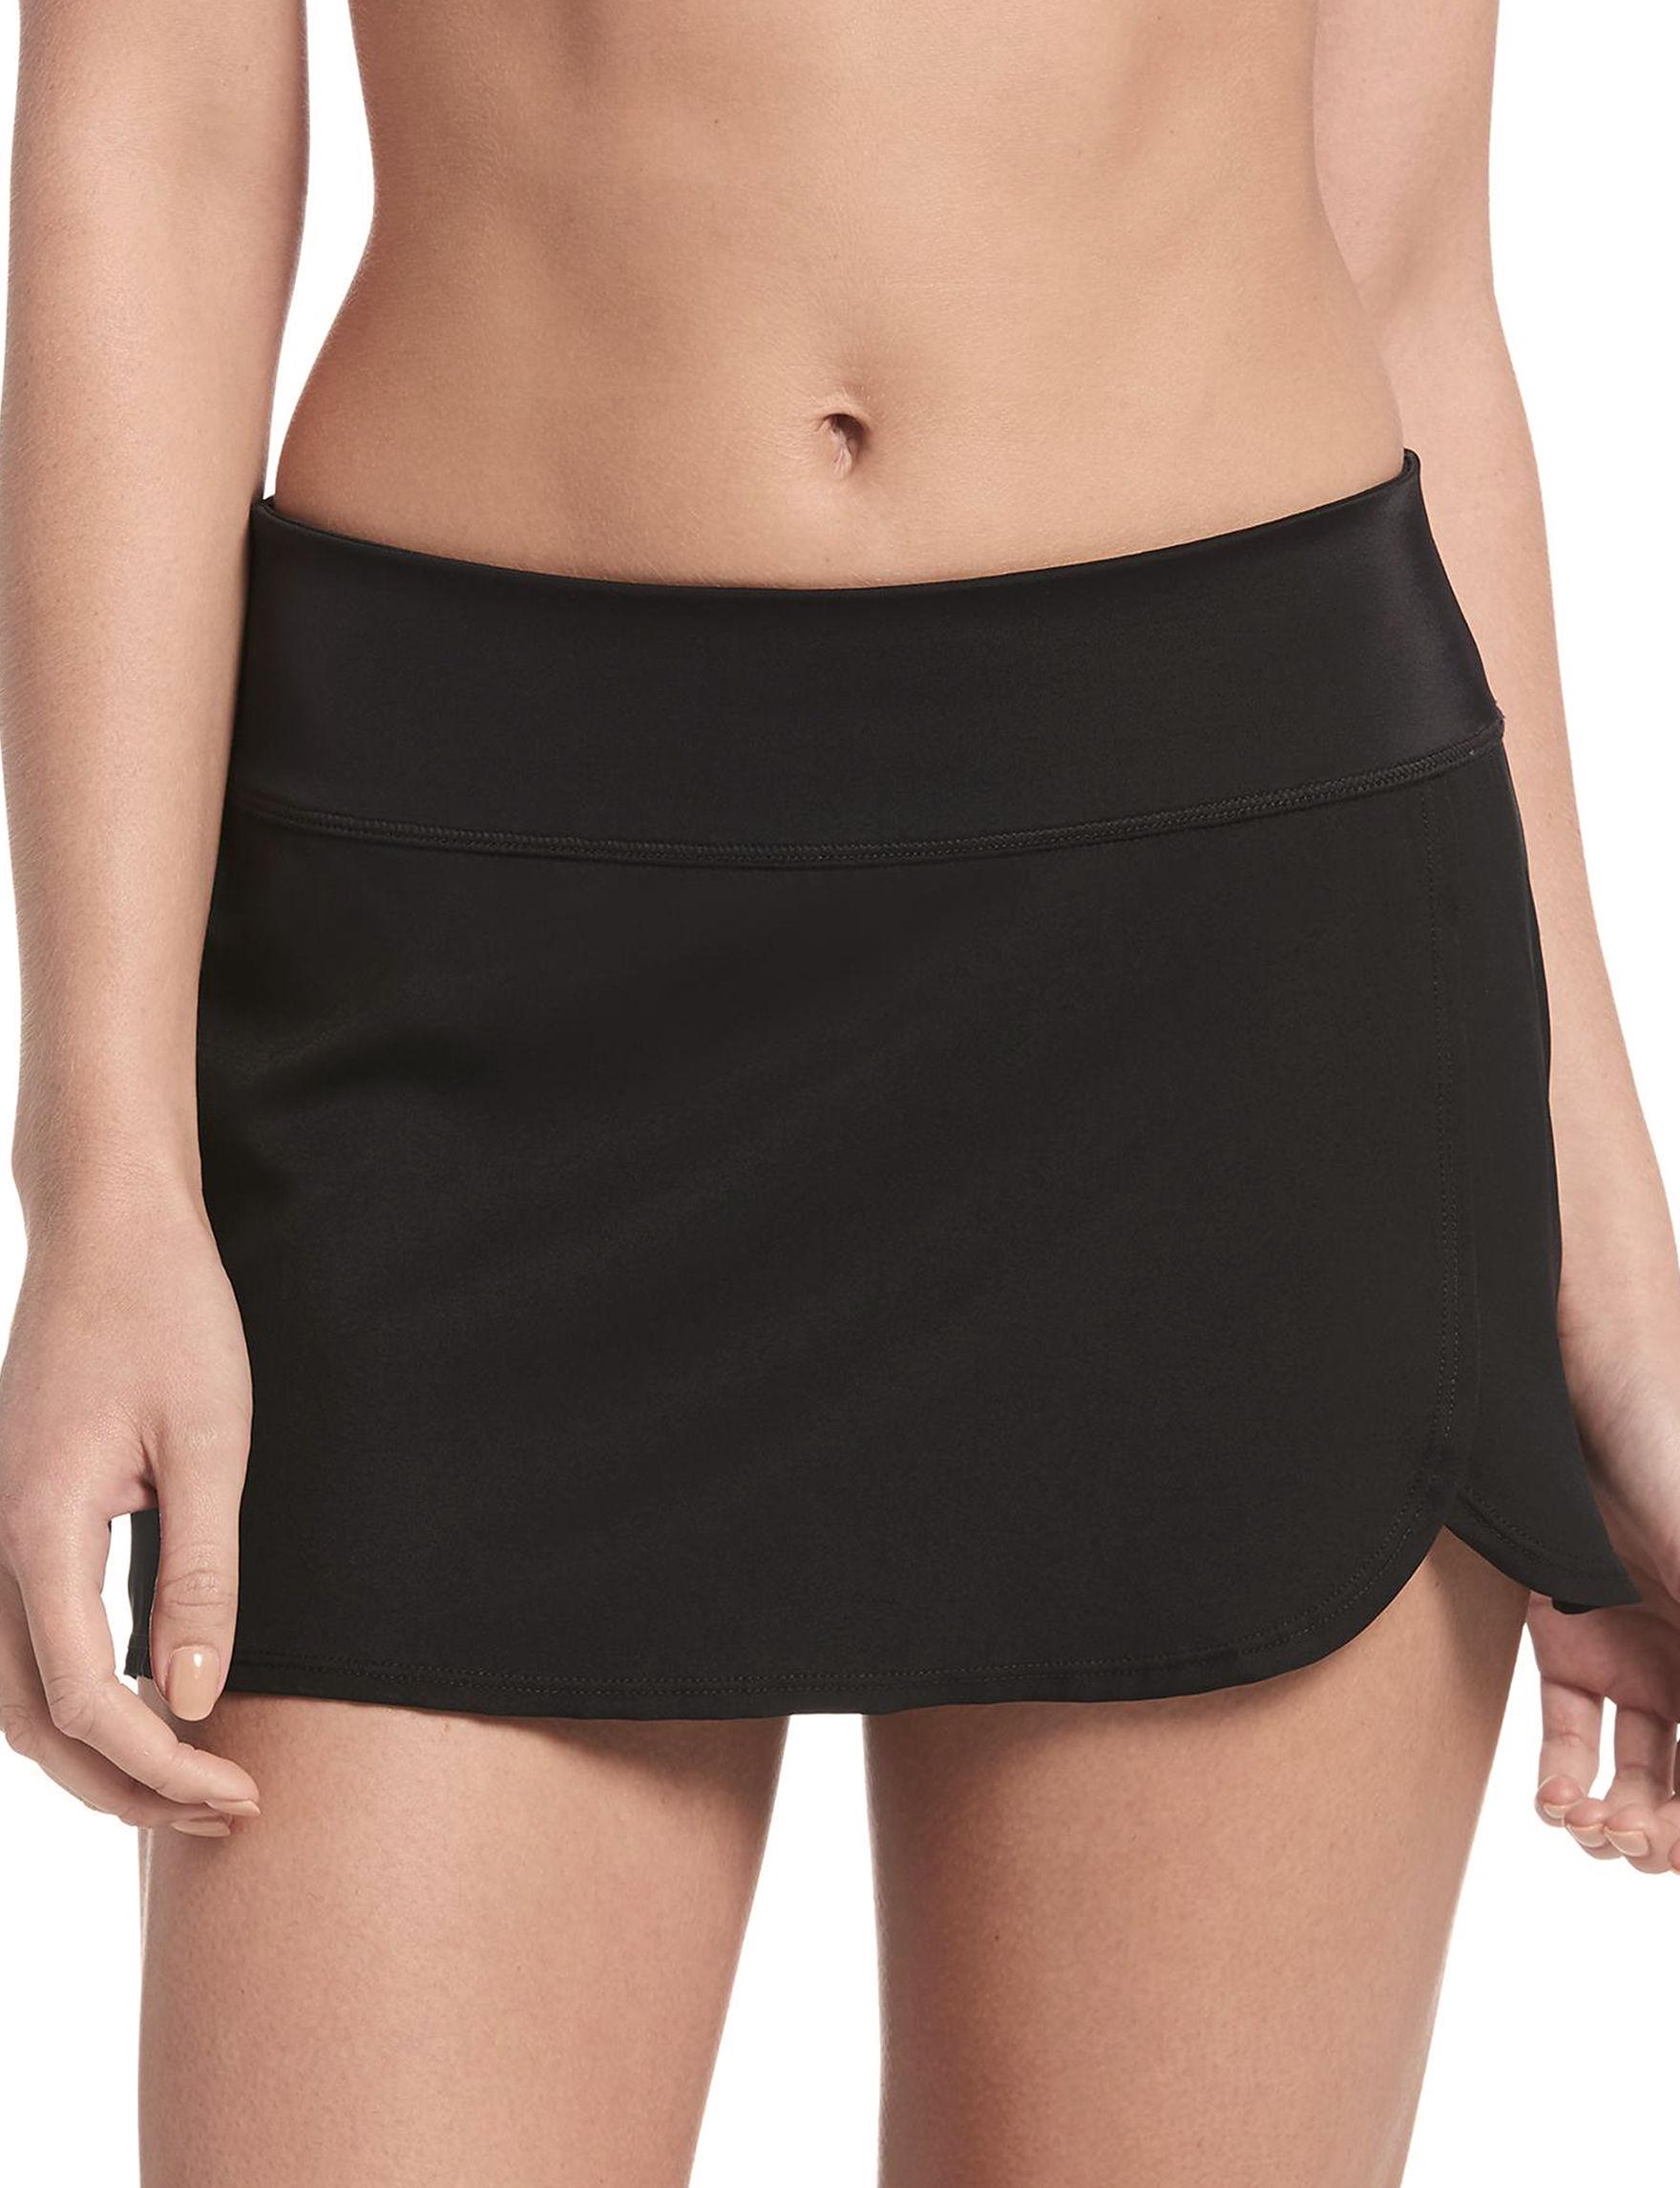 Nike Black Swimsuit Bottoms Skirtini